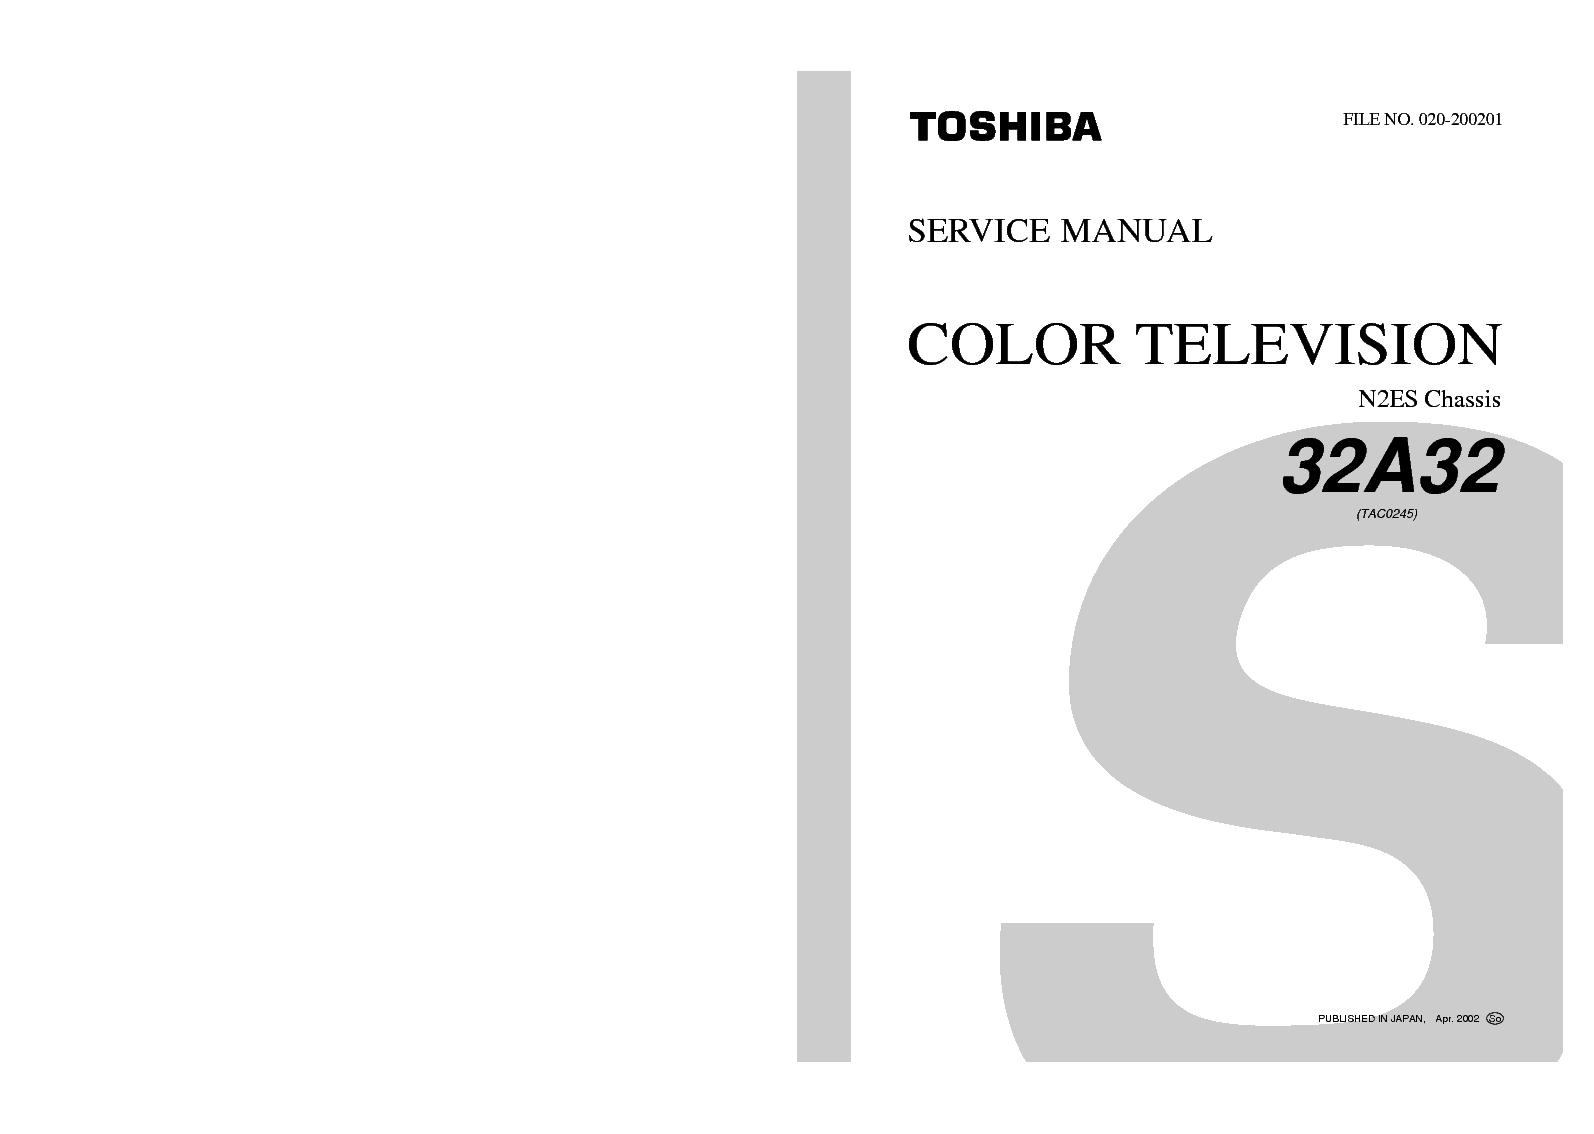 TOSHIBA 32A32